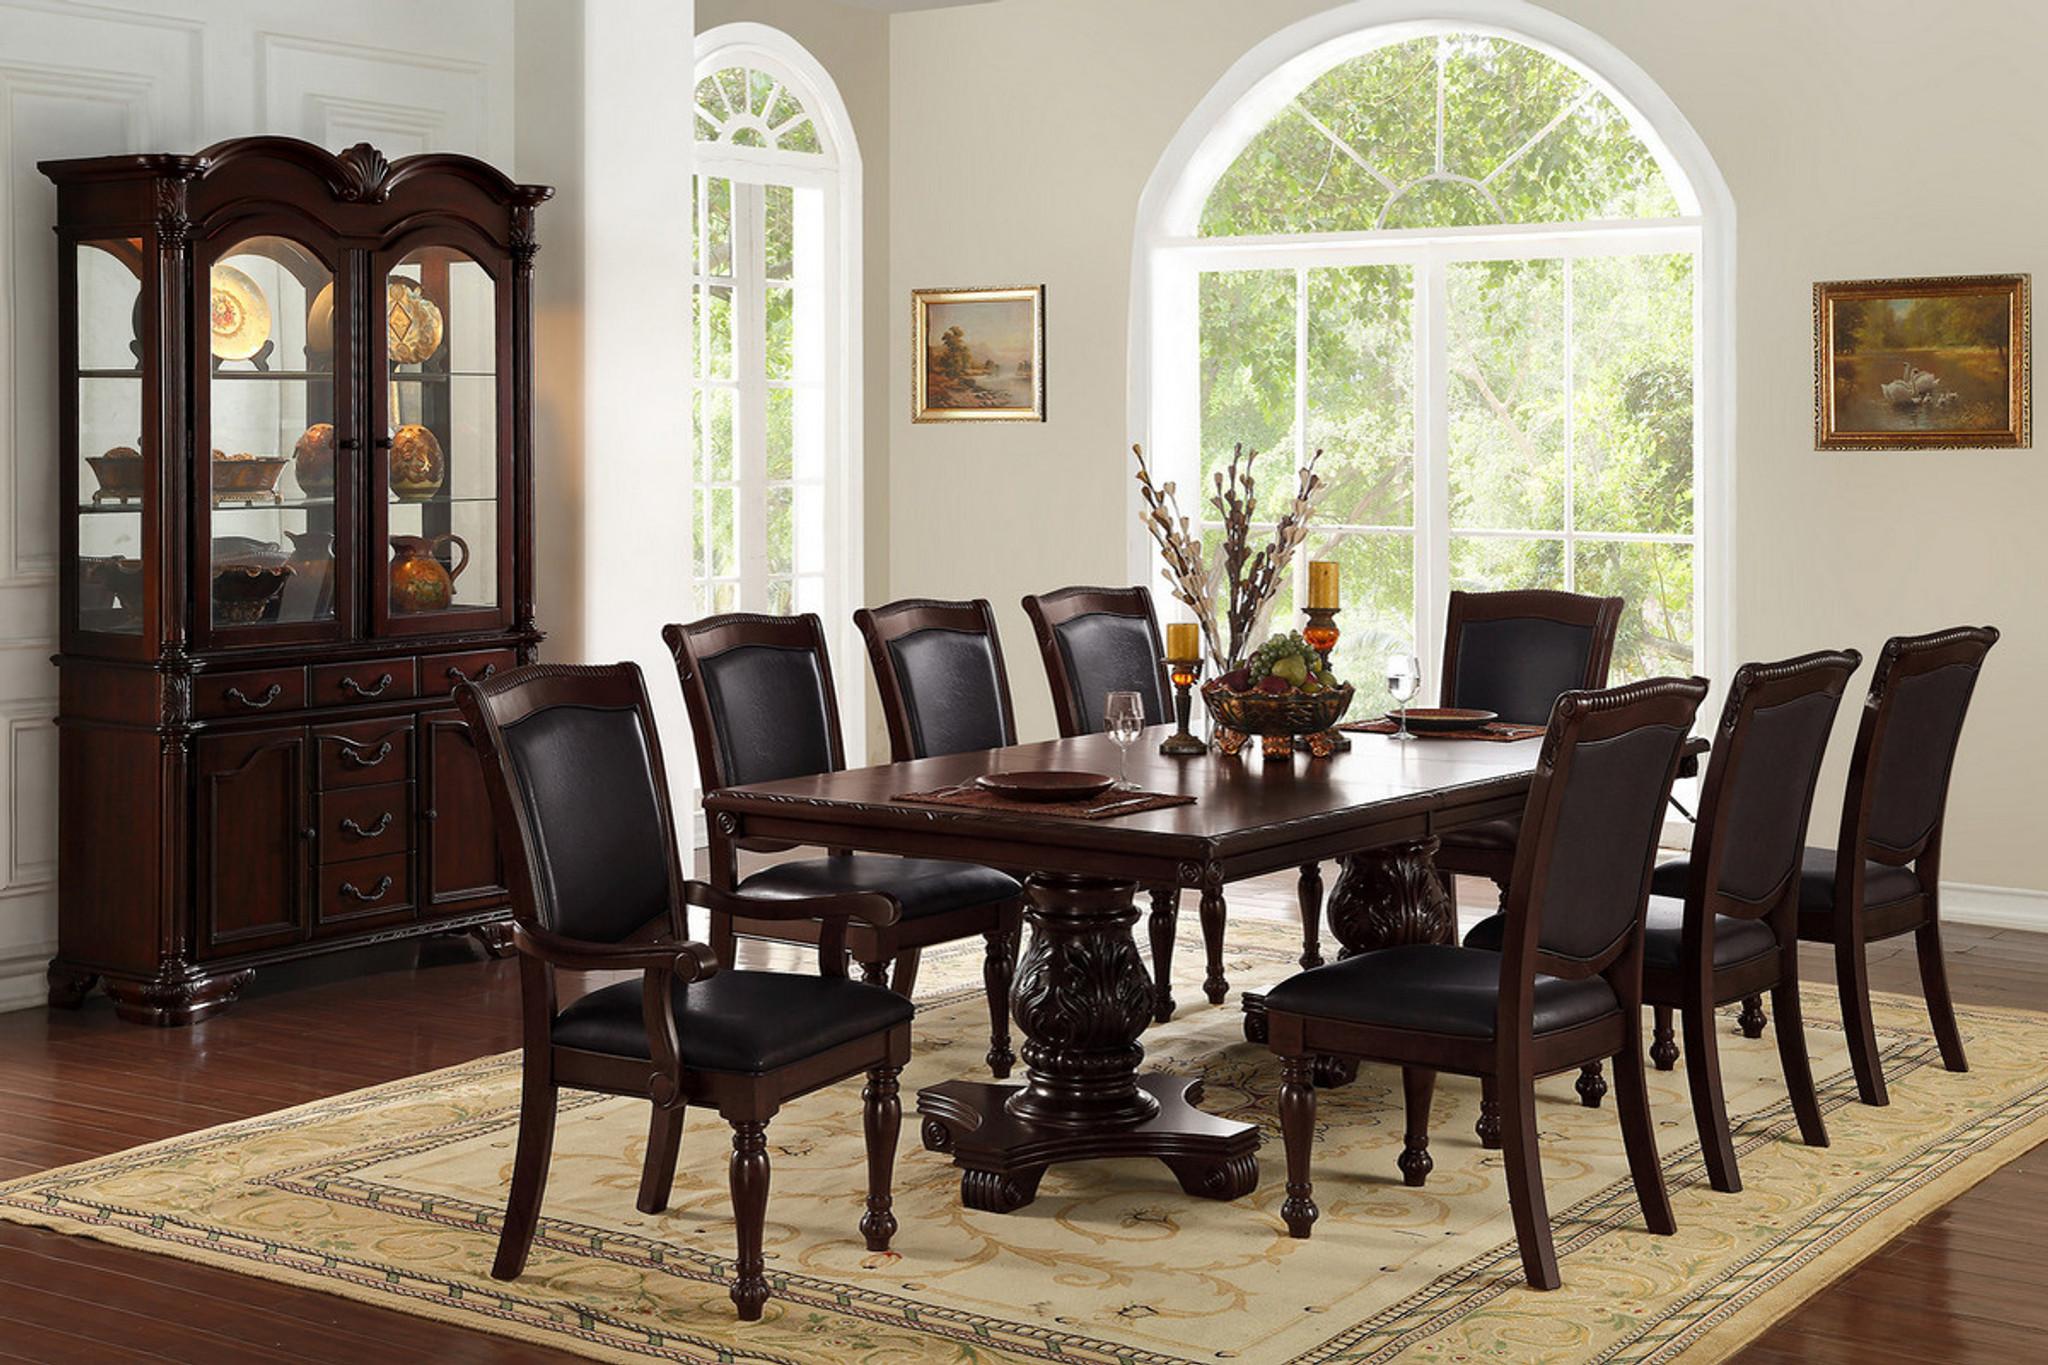 7PCS CHERRY DINING TABLE SET